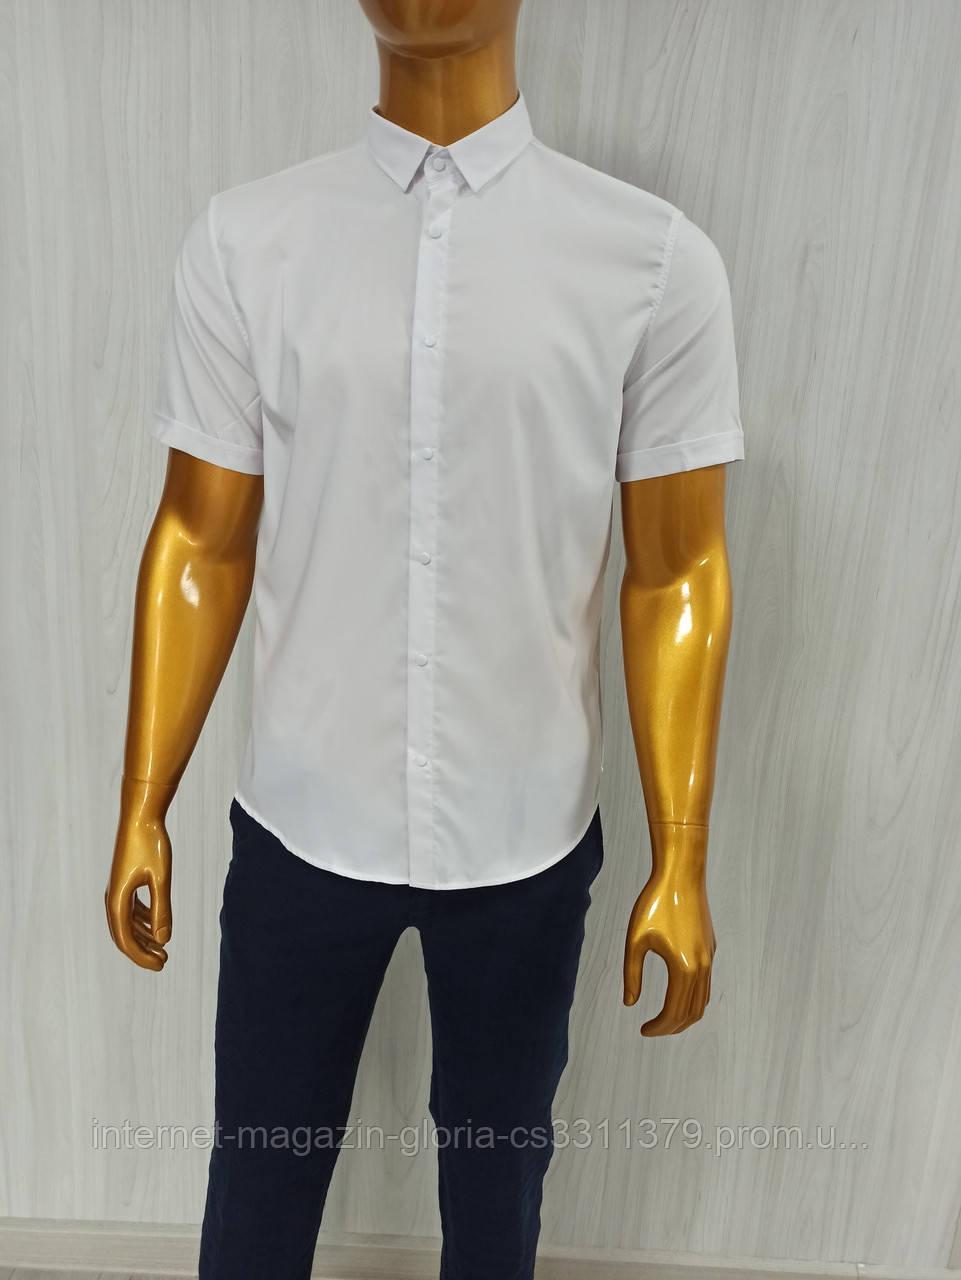 Мужская рубашка Amato. AG.18681-2. Размеры:M,L,XL(2), 2XL.